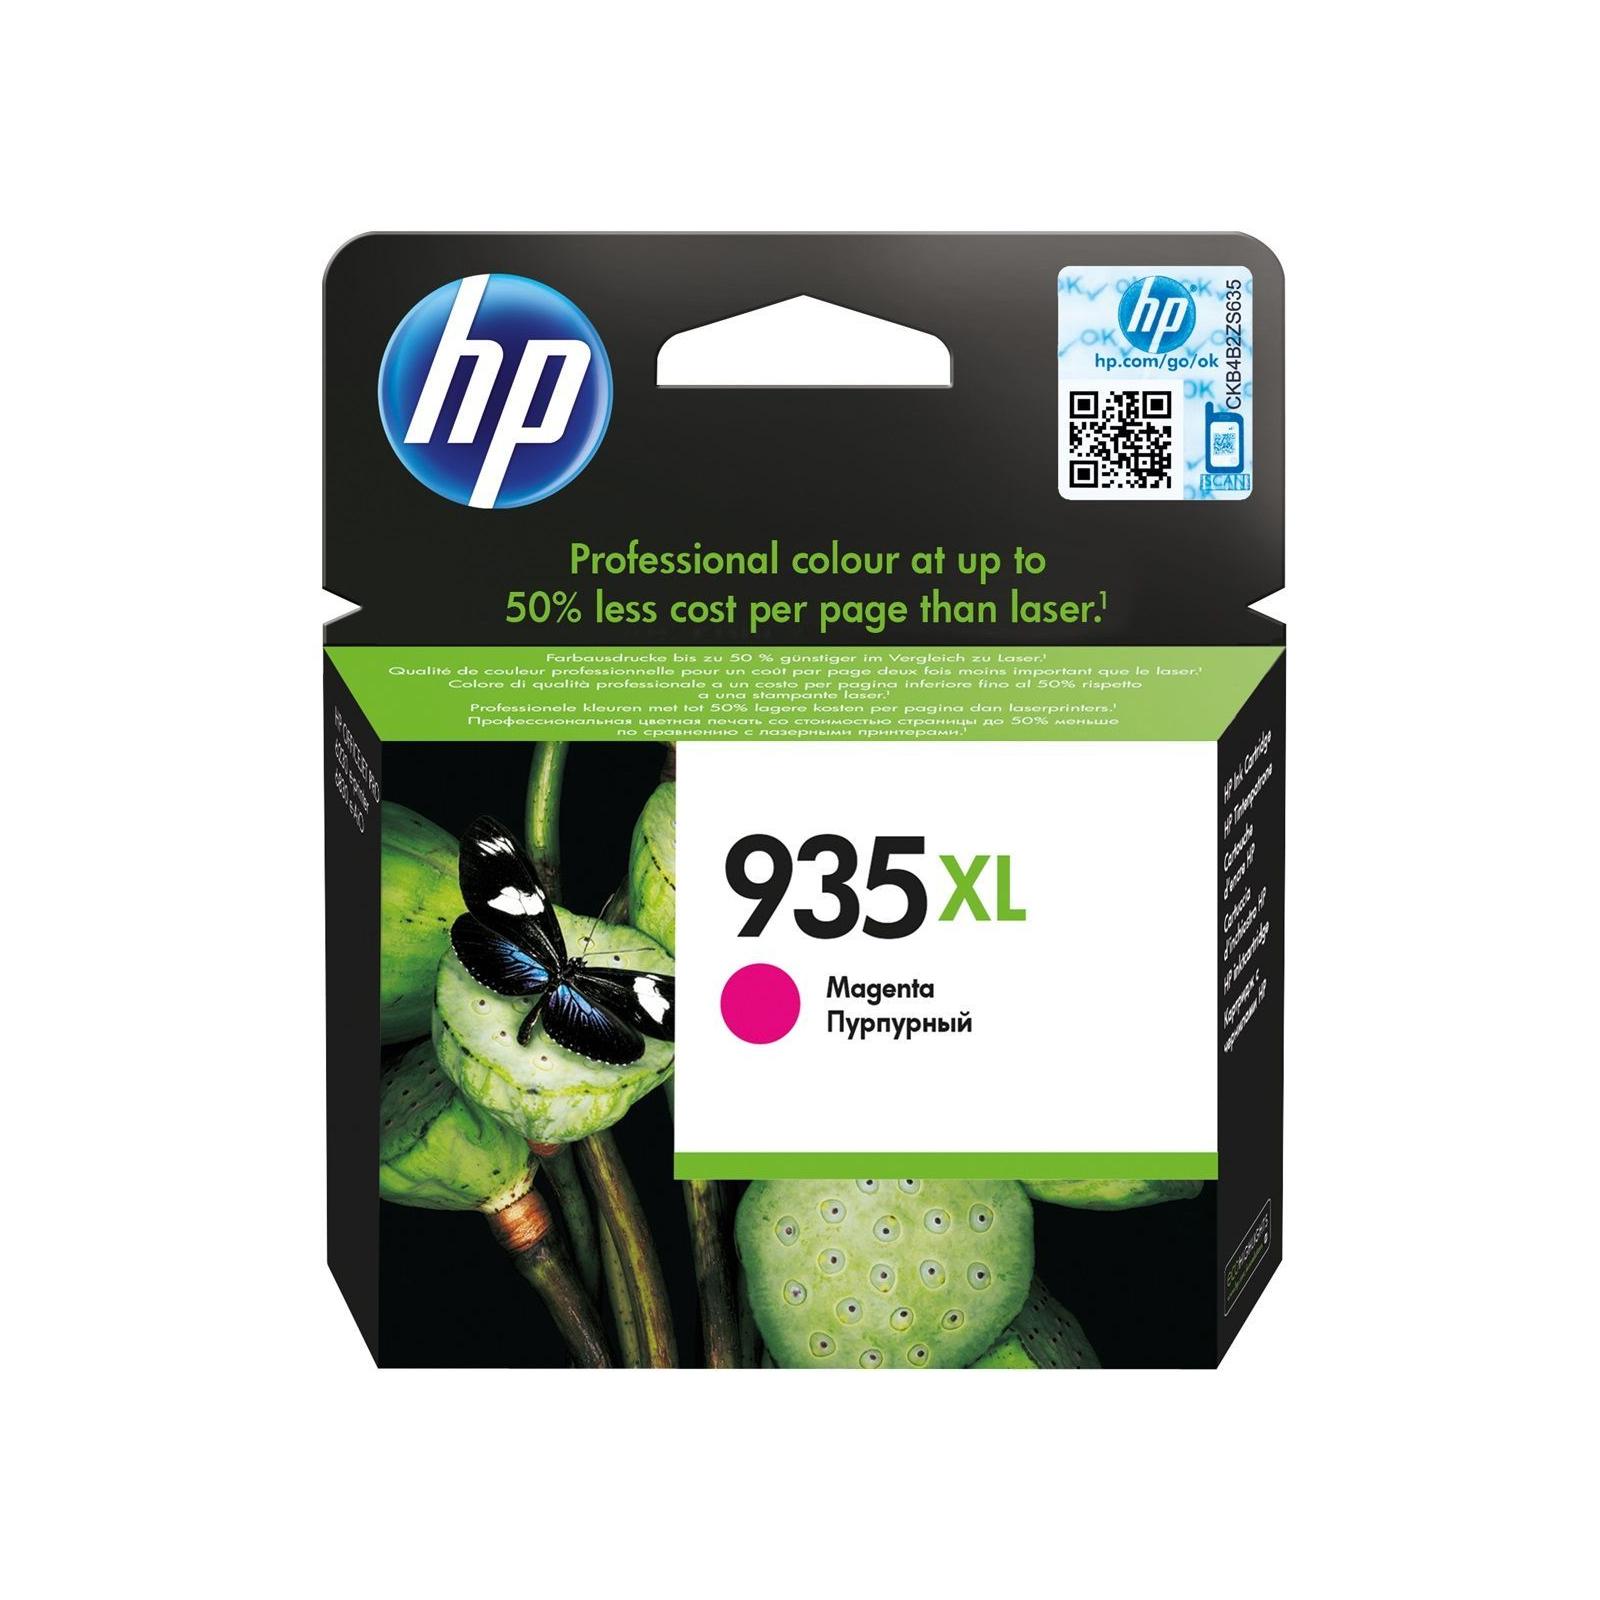 Картридж HP DJ No.935XL Magenta (C2P25AE)